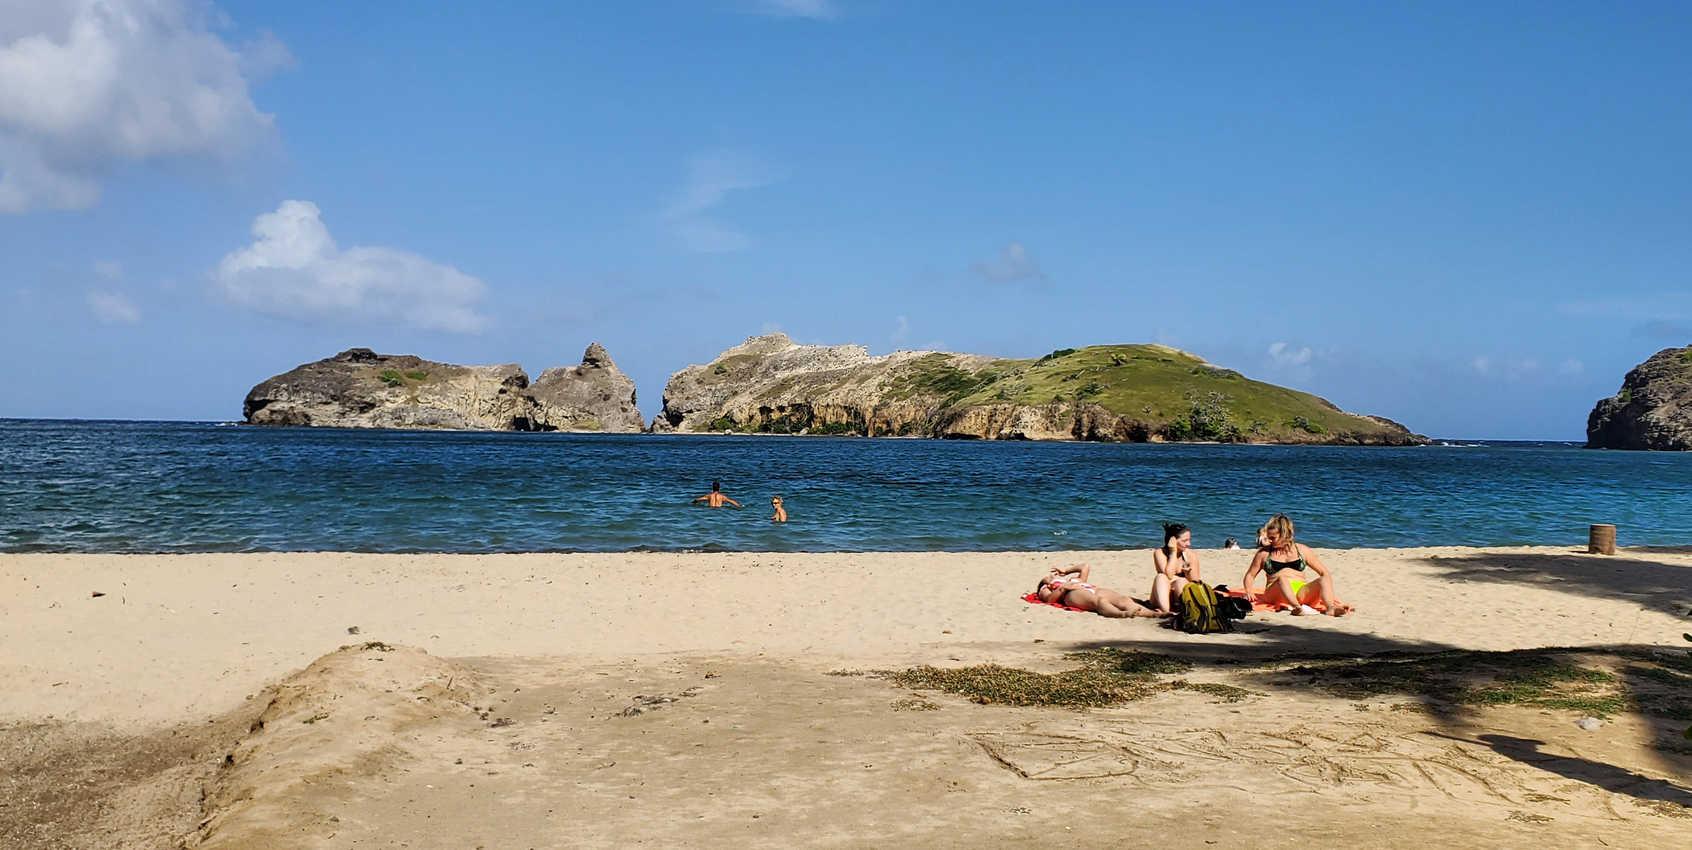 Enjoying a quiet afternoon on Pompierre Beach, Les Saintes